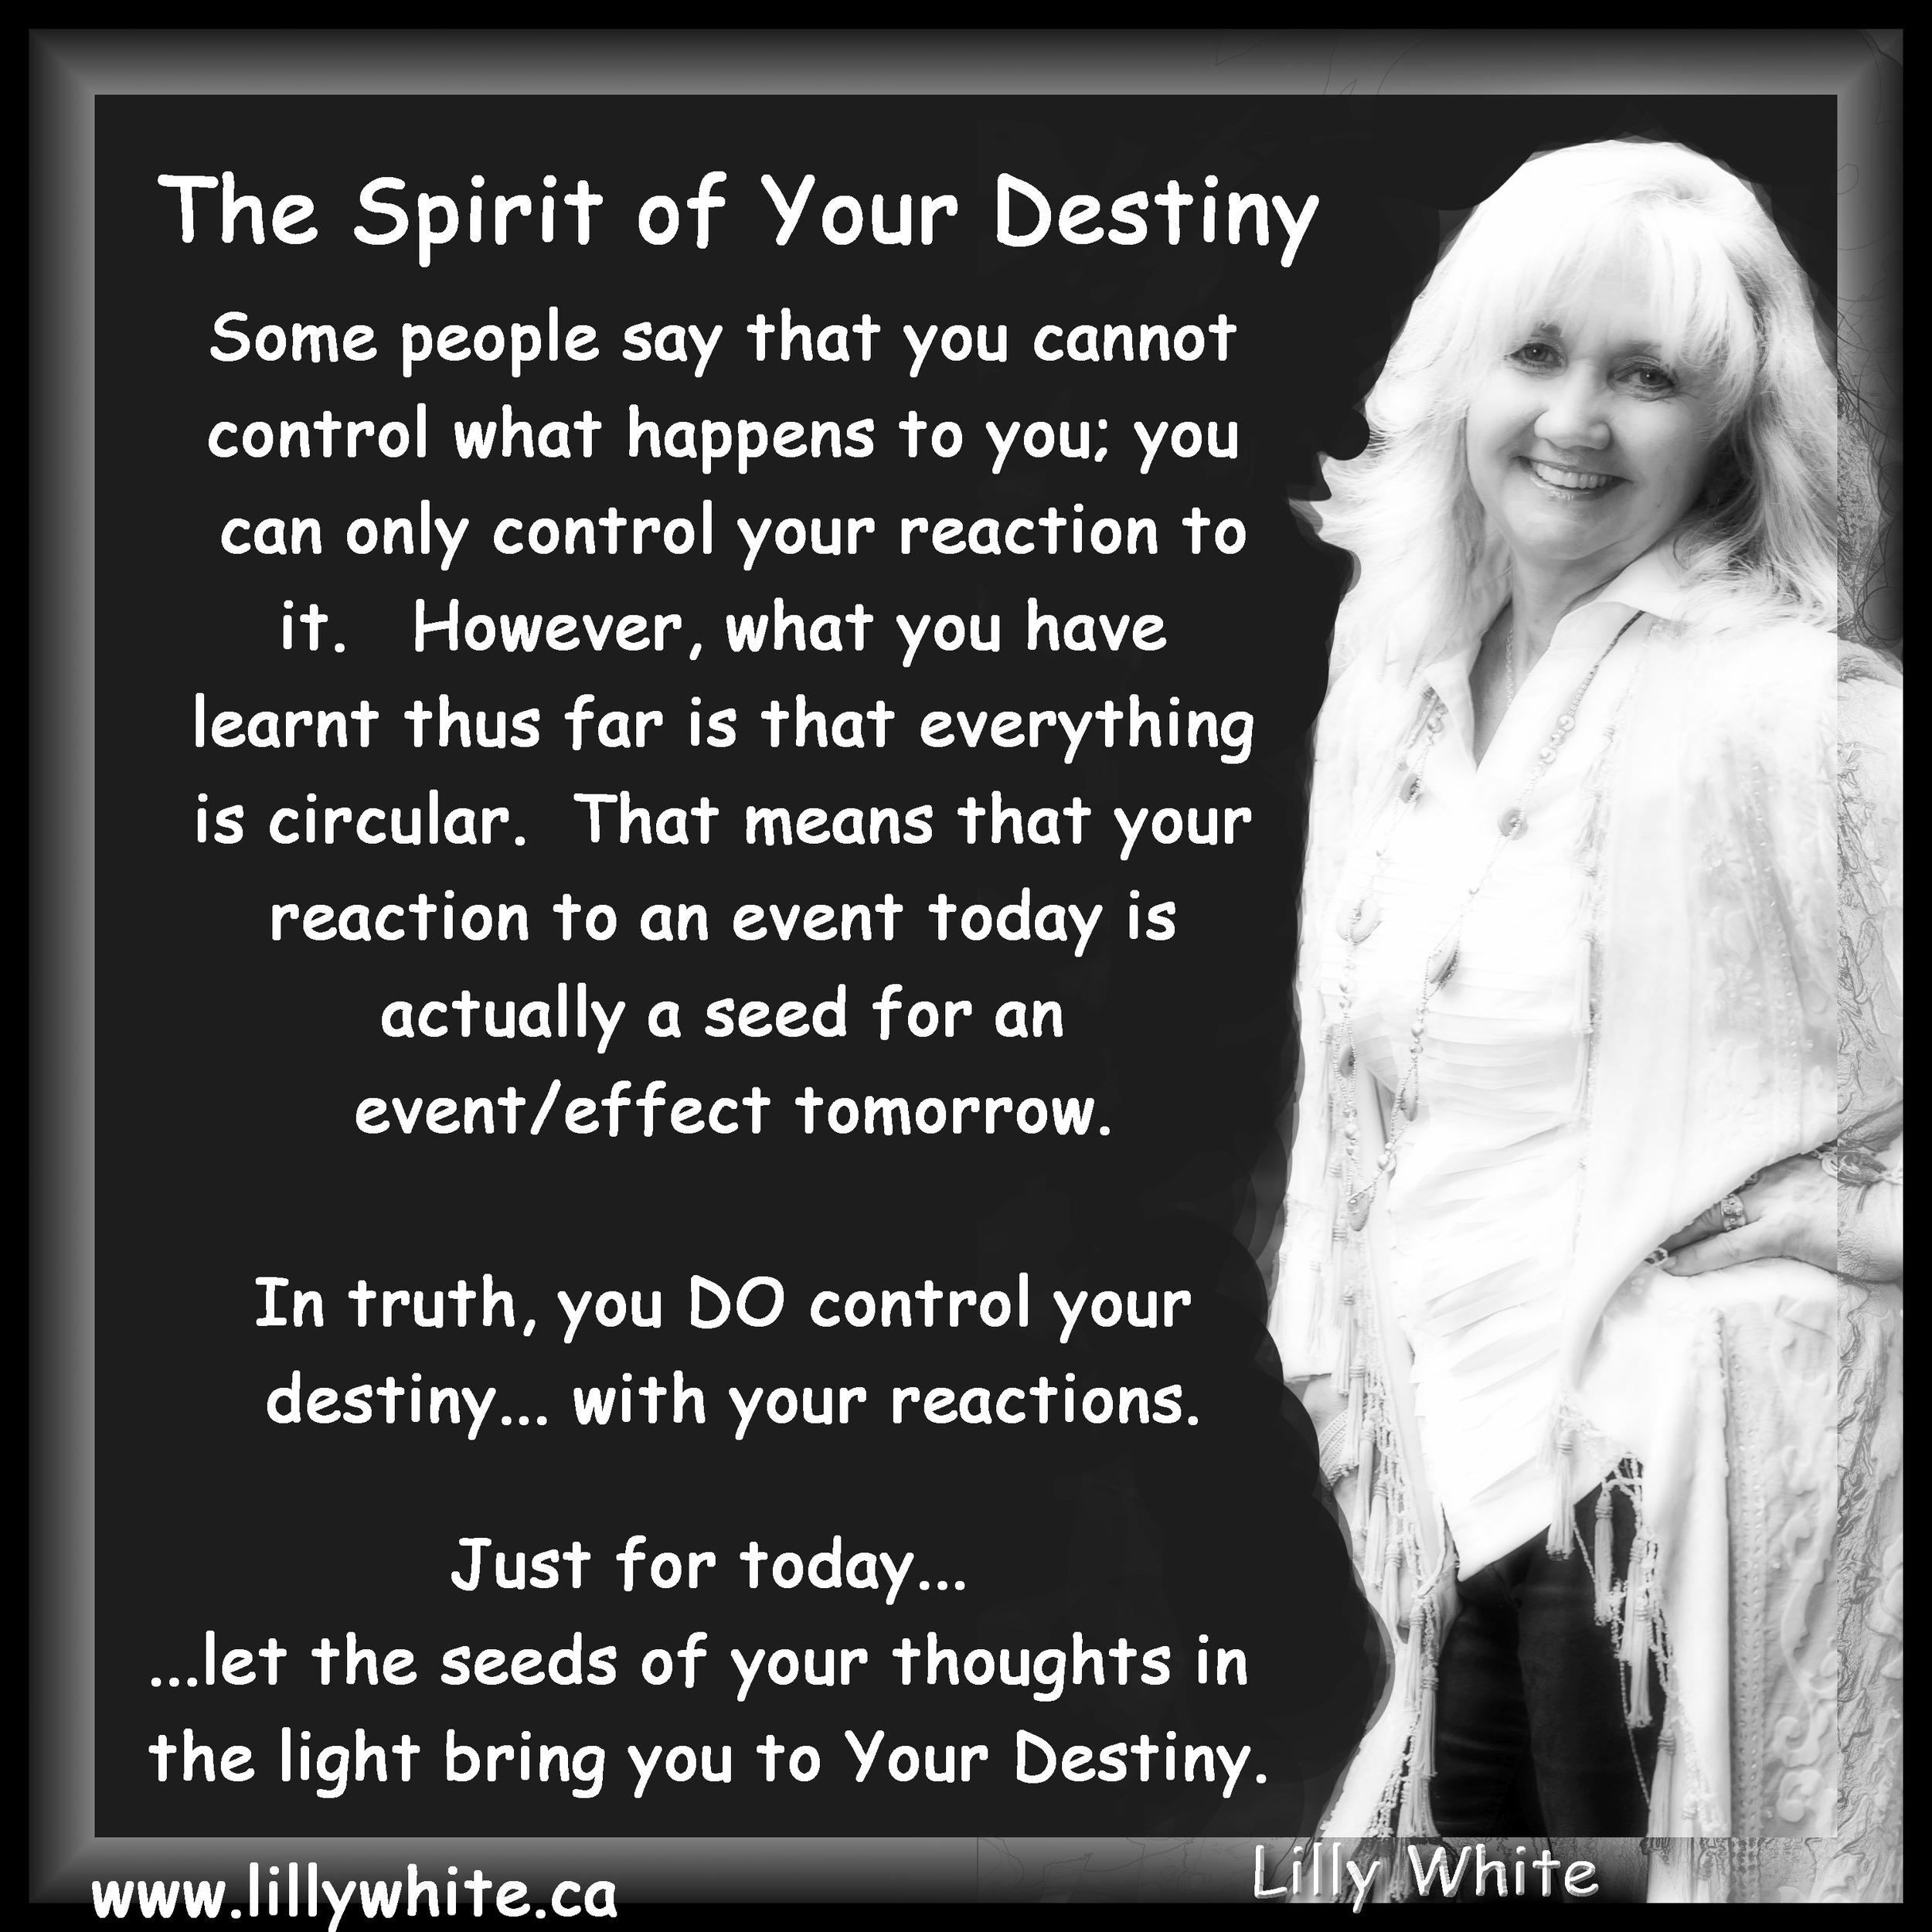 LW Spiriit of Destiny.jpg